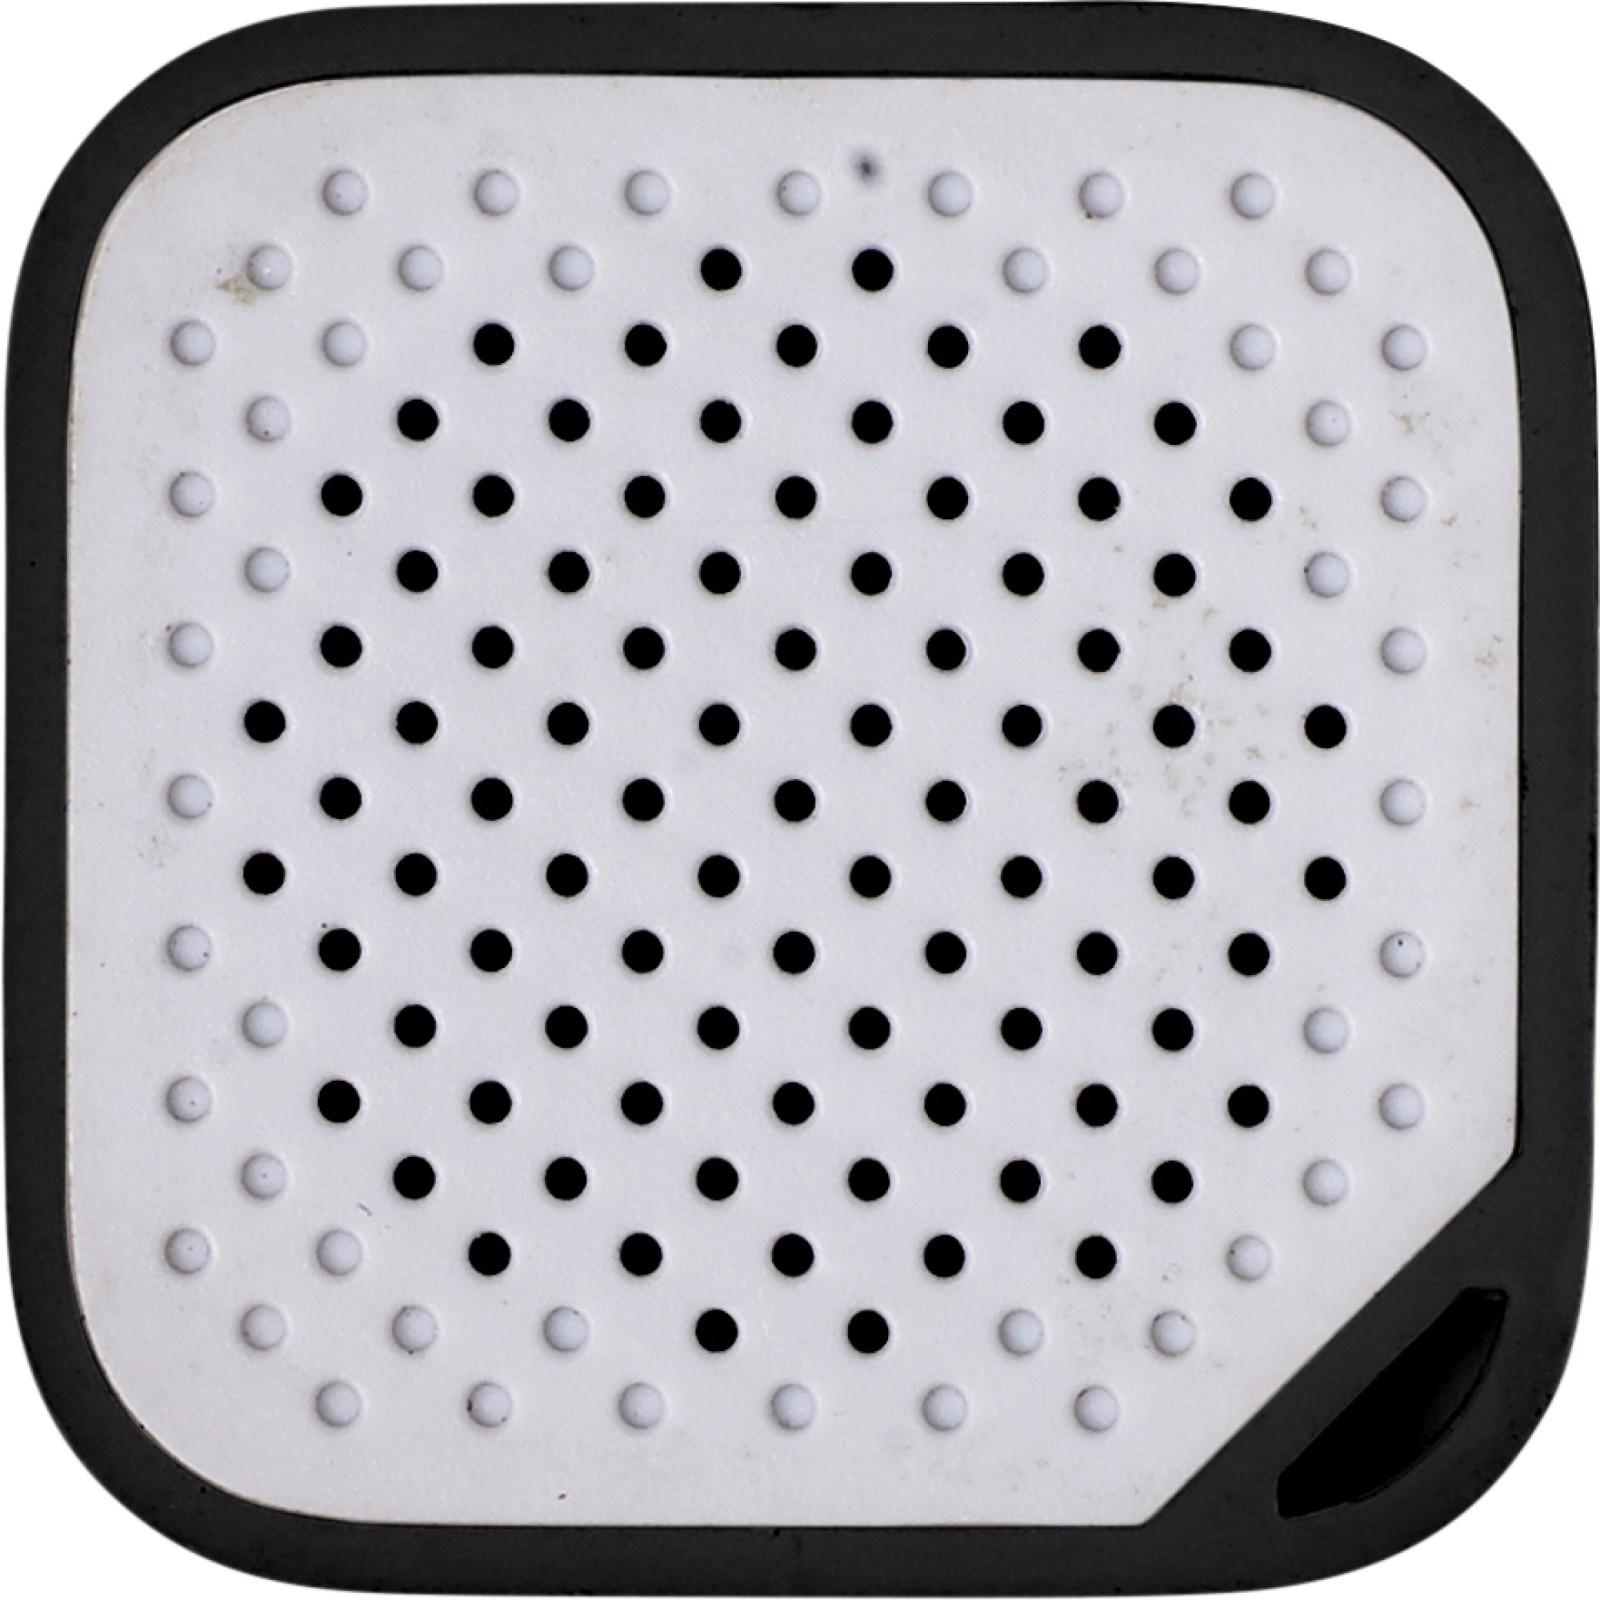 ABS 2-in-1 speaker - Black